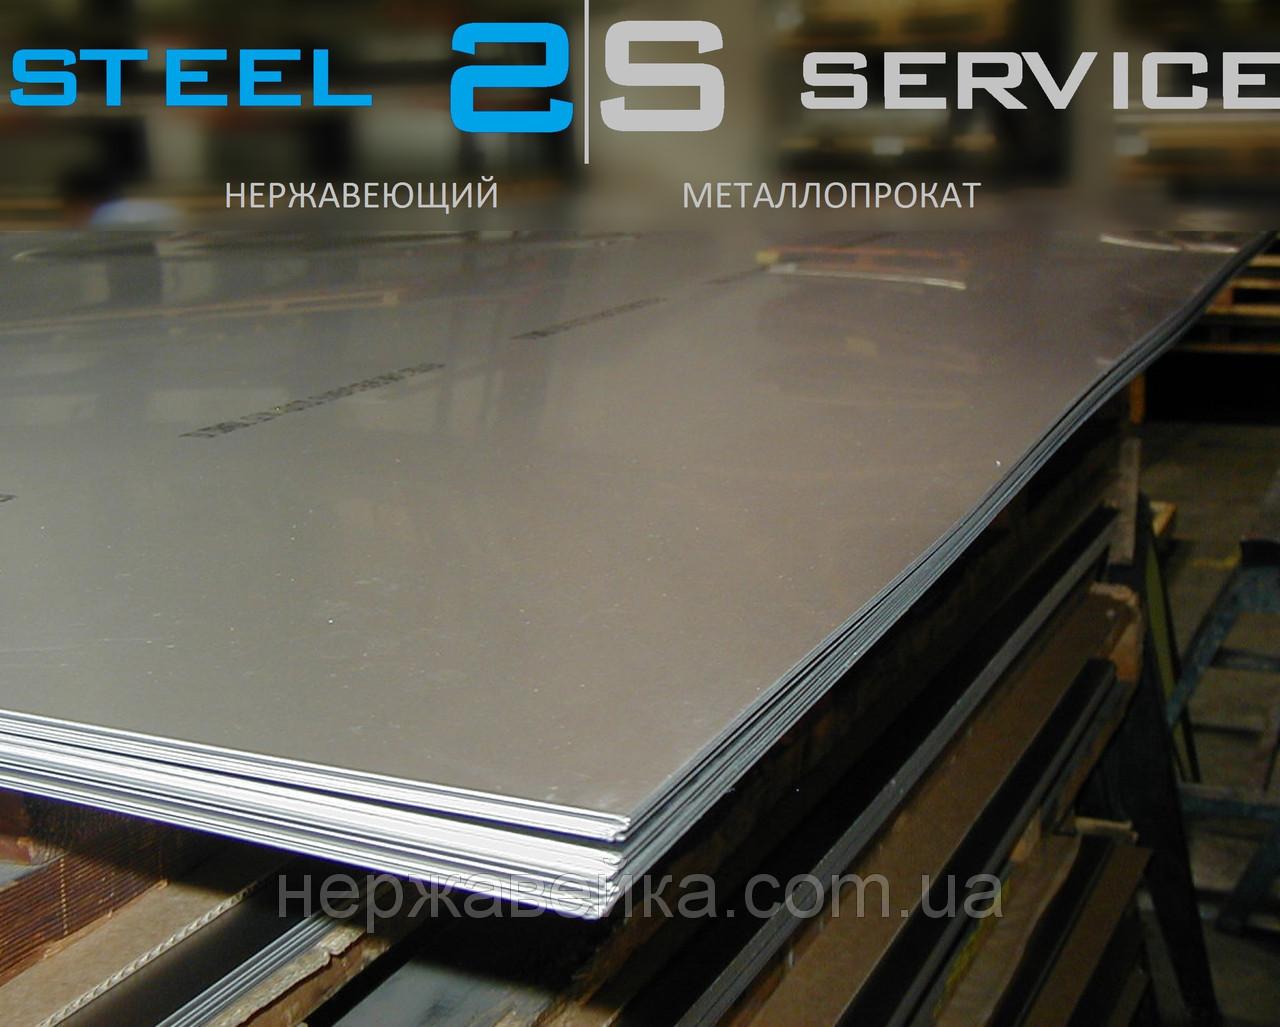 Листовая нержавейка 20х1500х3000мм  AISI 316Ti(10Х17Н13М2Т) F1 - горячекатанный,  кислотостойкий